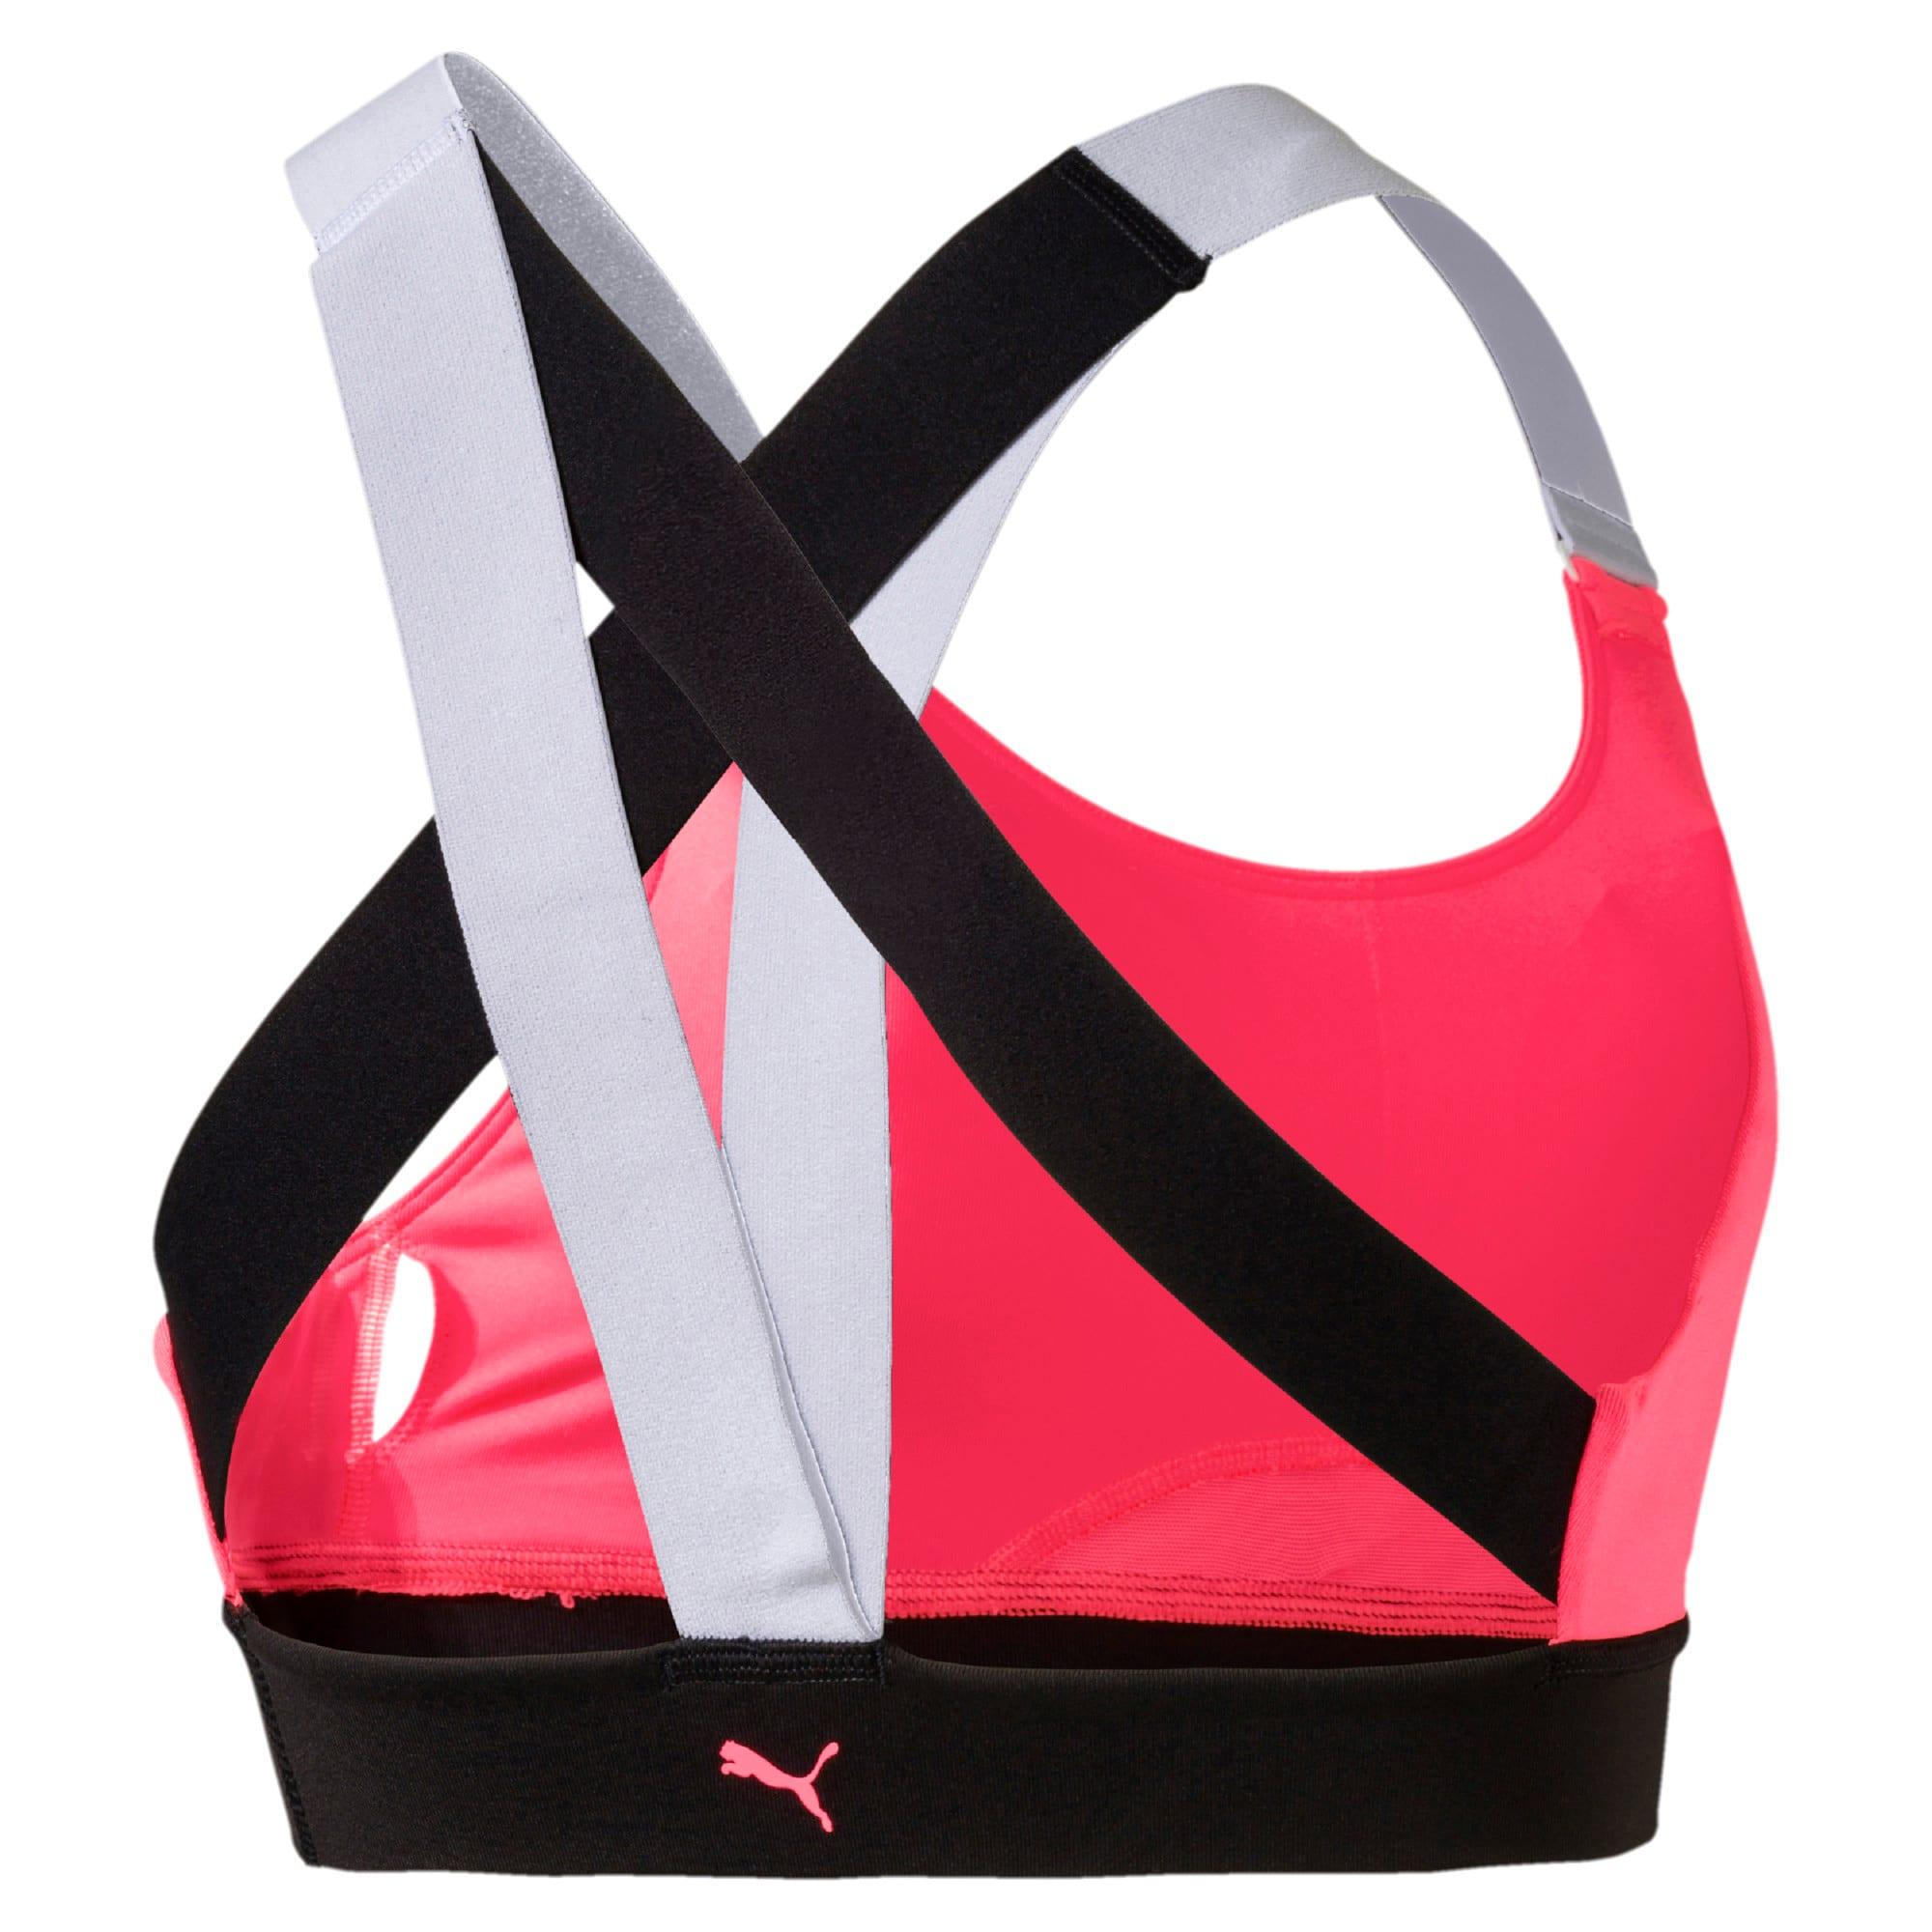 Thumbnail 5 of Feel It Women's Training Bra, Pink Alert-Puma Black-White, medium-IND